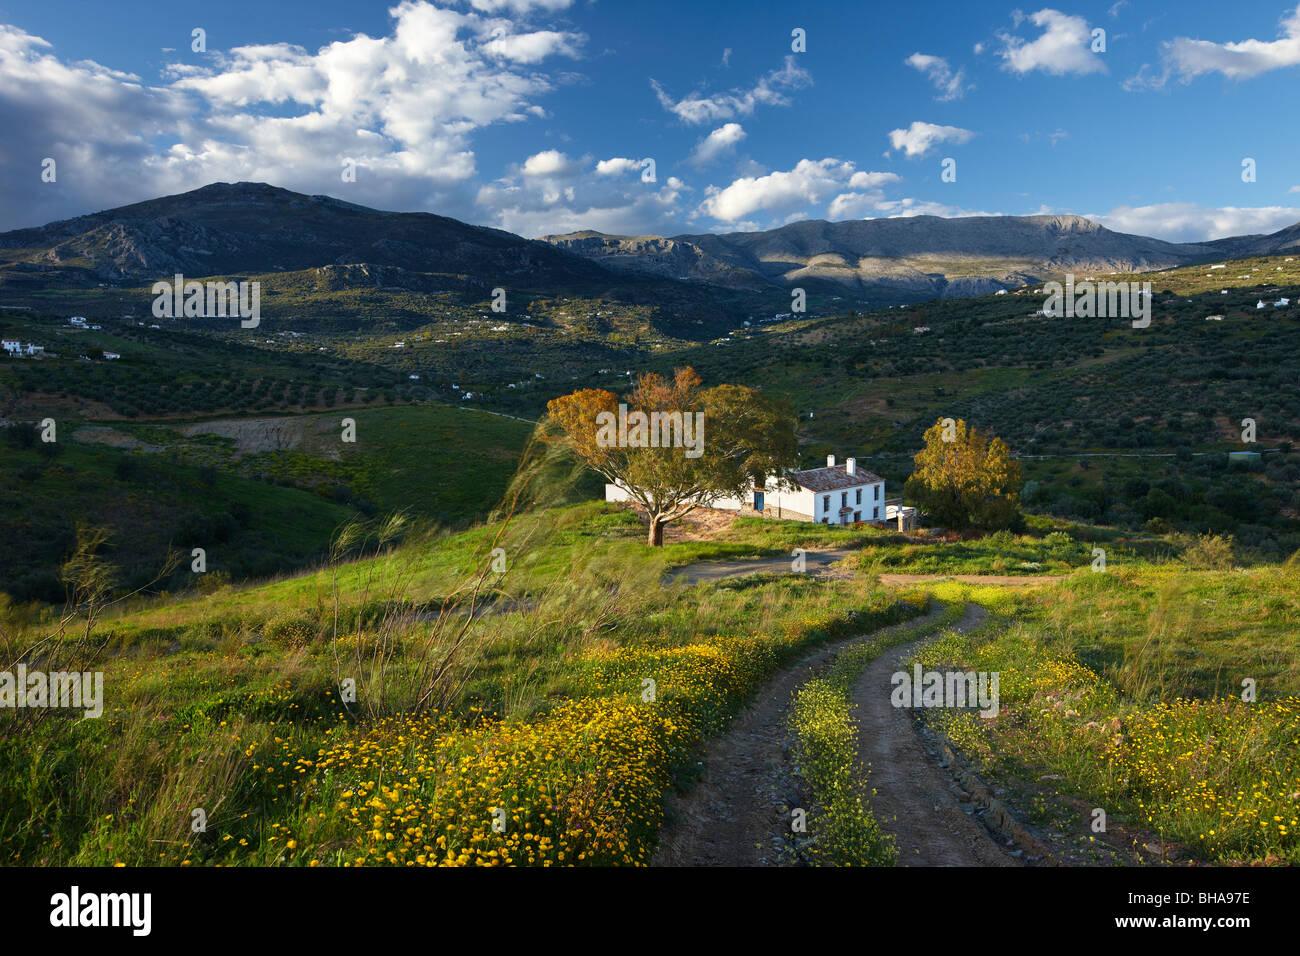 ein Haus auf dem Campo Nr. Los Molinos, Periana, Andalusien, Spanien Stockbild